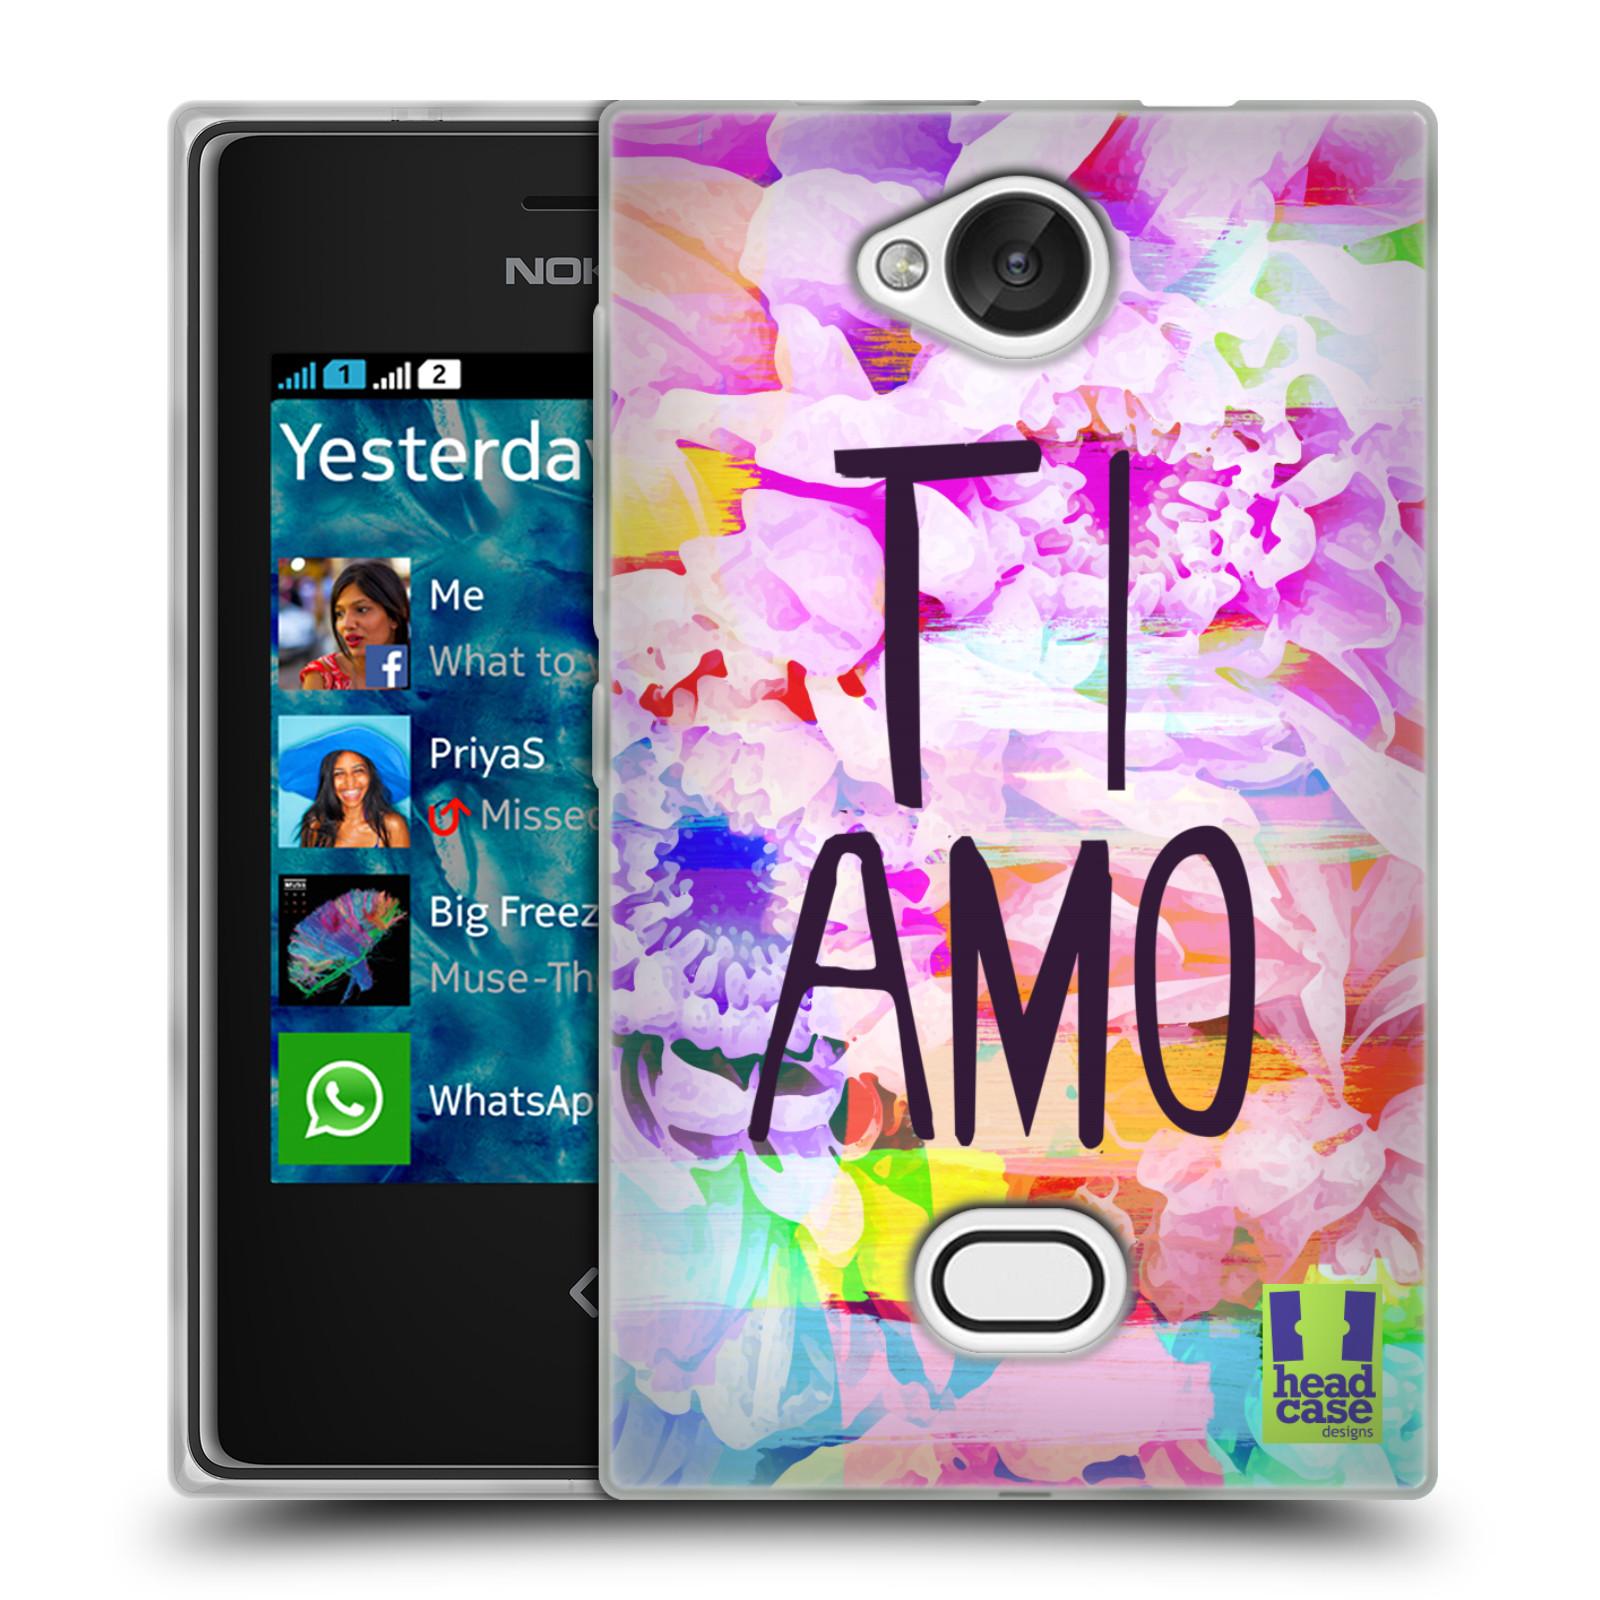 HEAD CASE silikonový obal na mobil Nokia Asha 503 Láska a květy Ti Amo